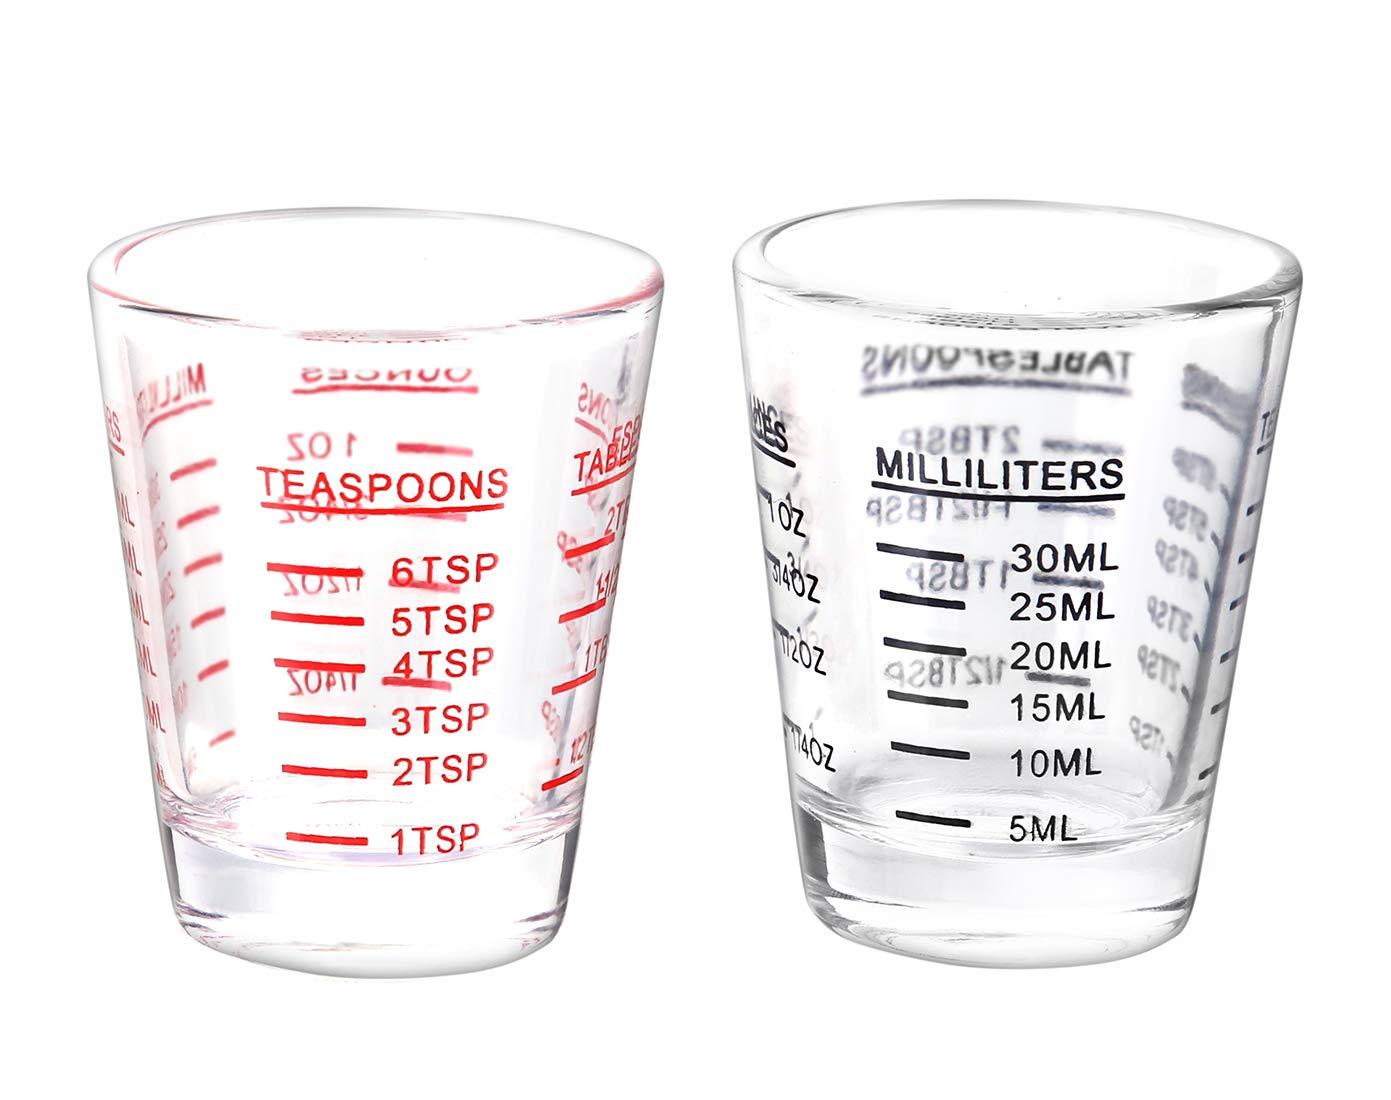 Shot Glasses Measuring cup Espresso Shot Glass Liquid Heavy Glass Wine Glass 2 Pack 26-Incremental Measurement 1oz, 6 Tsp, 2 Tbs, 30ml (Black and Red)